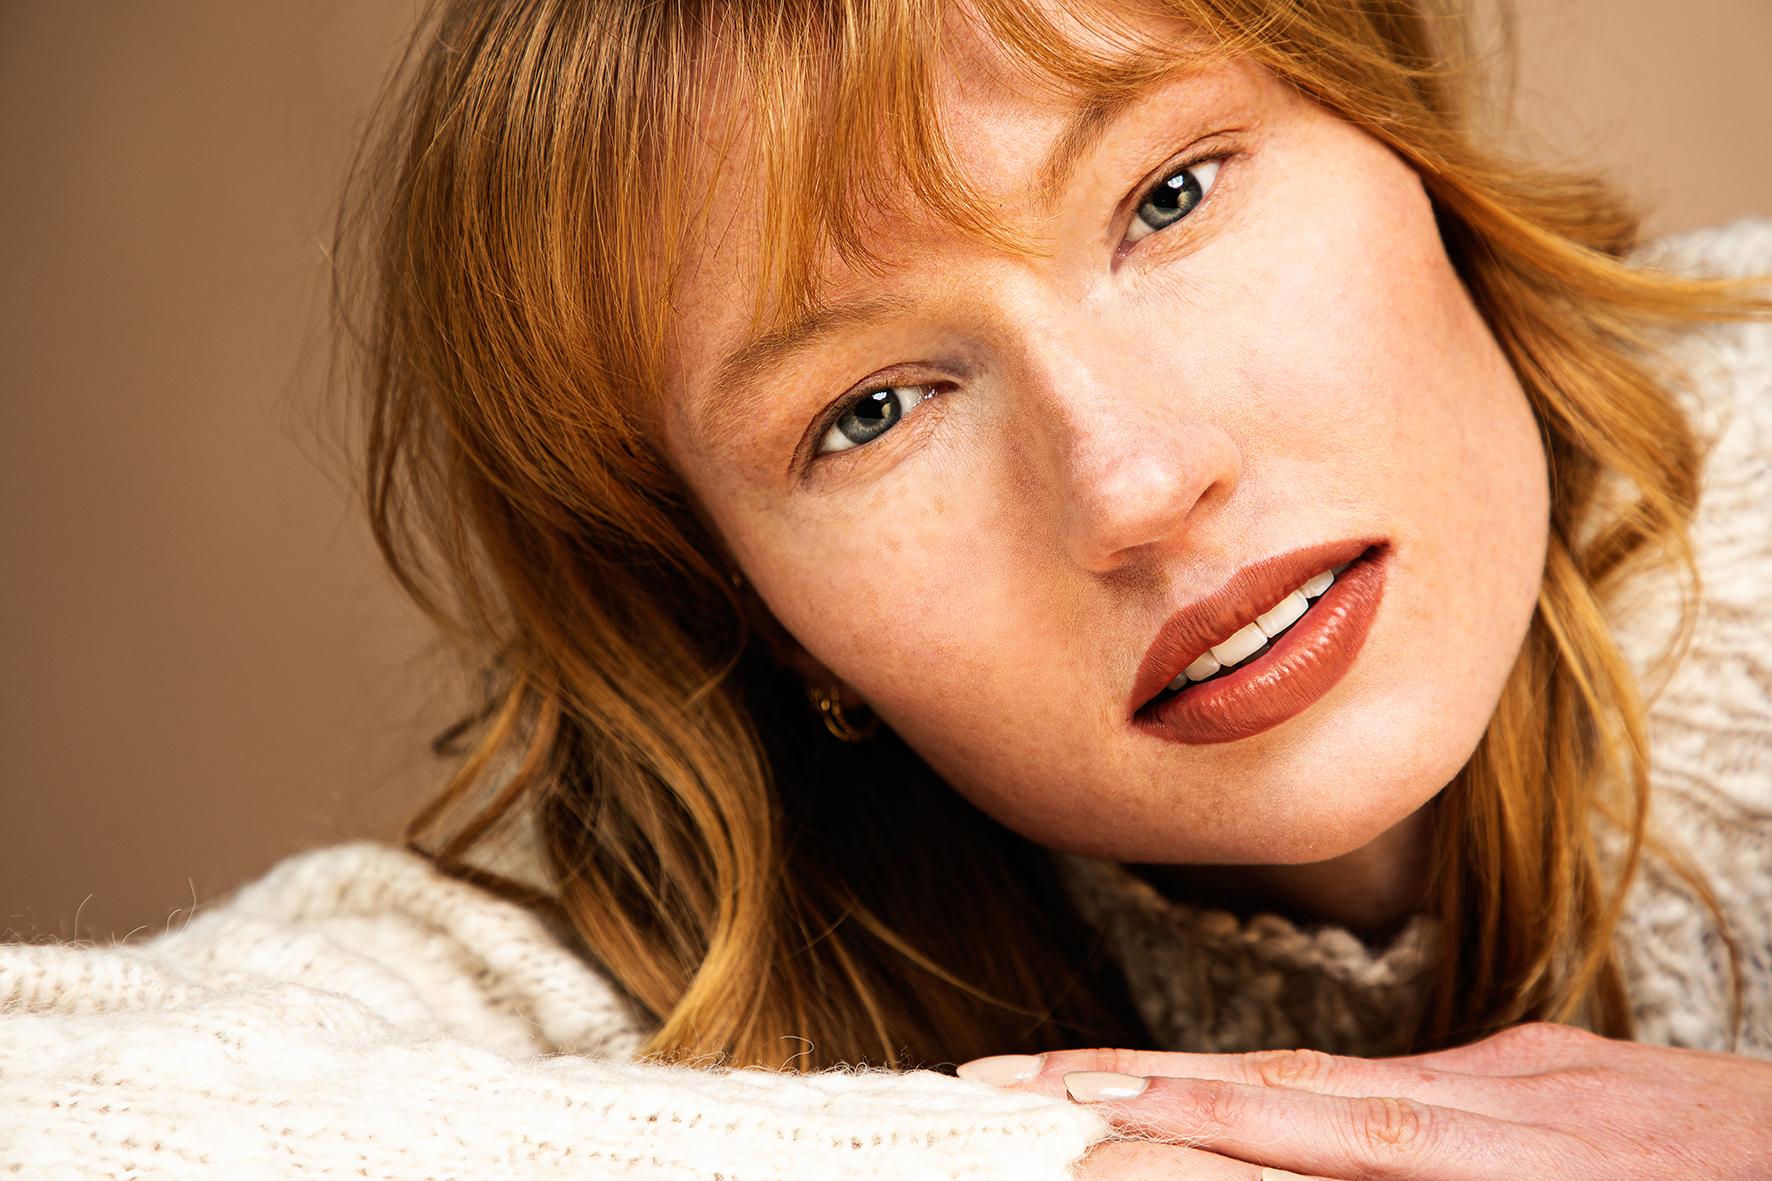 meisje-model-makeup-ginger